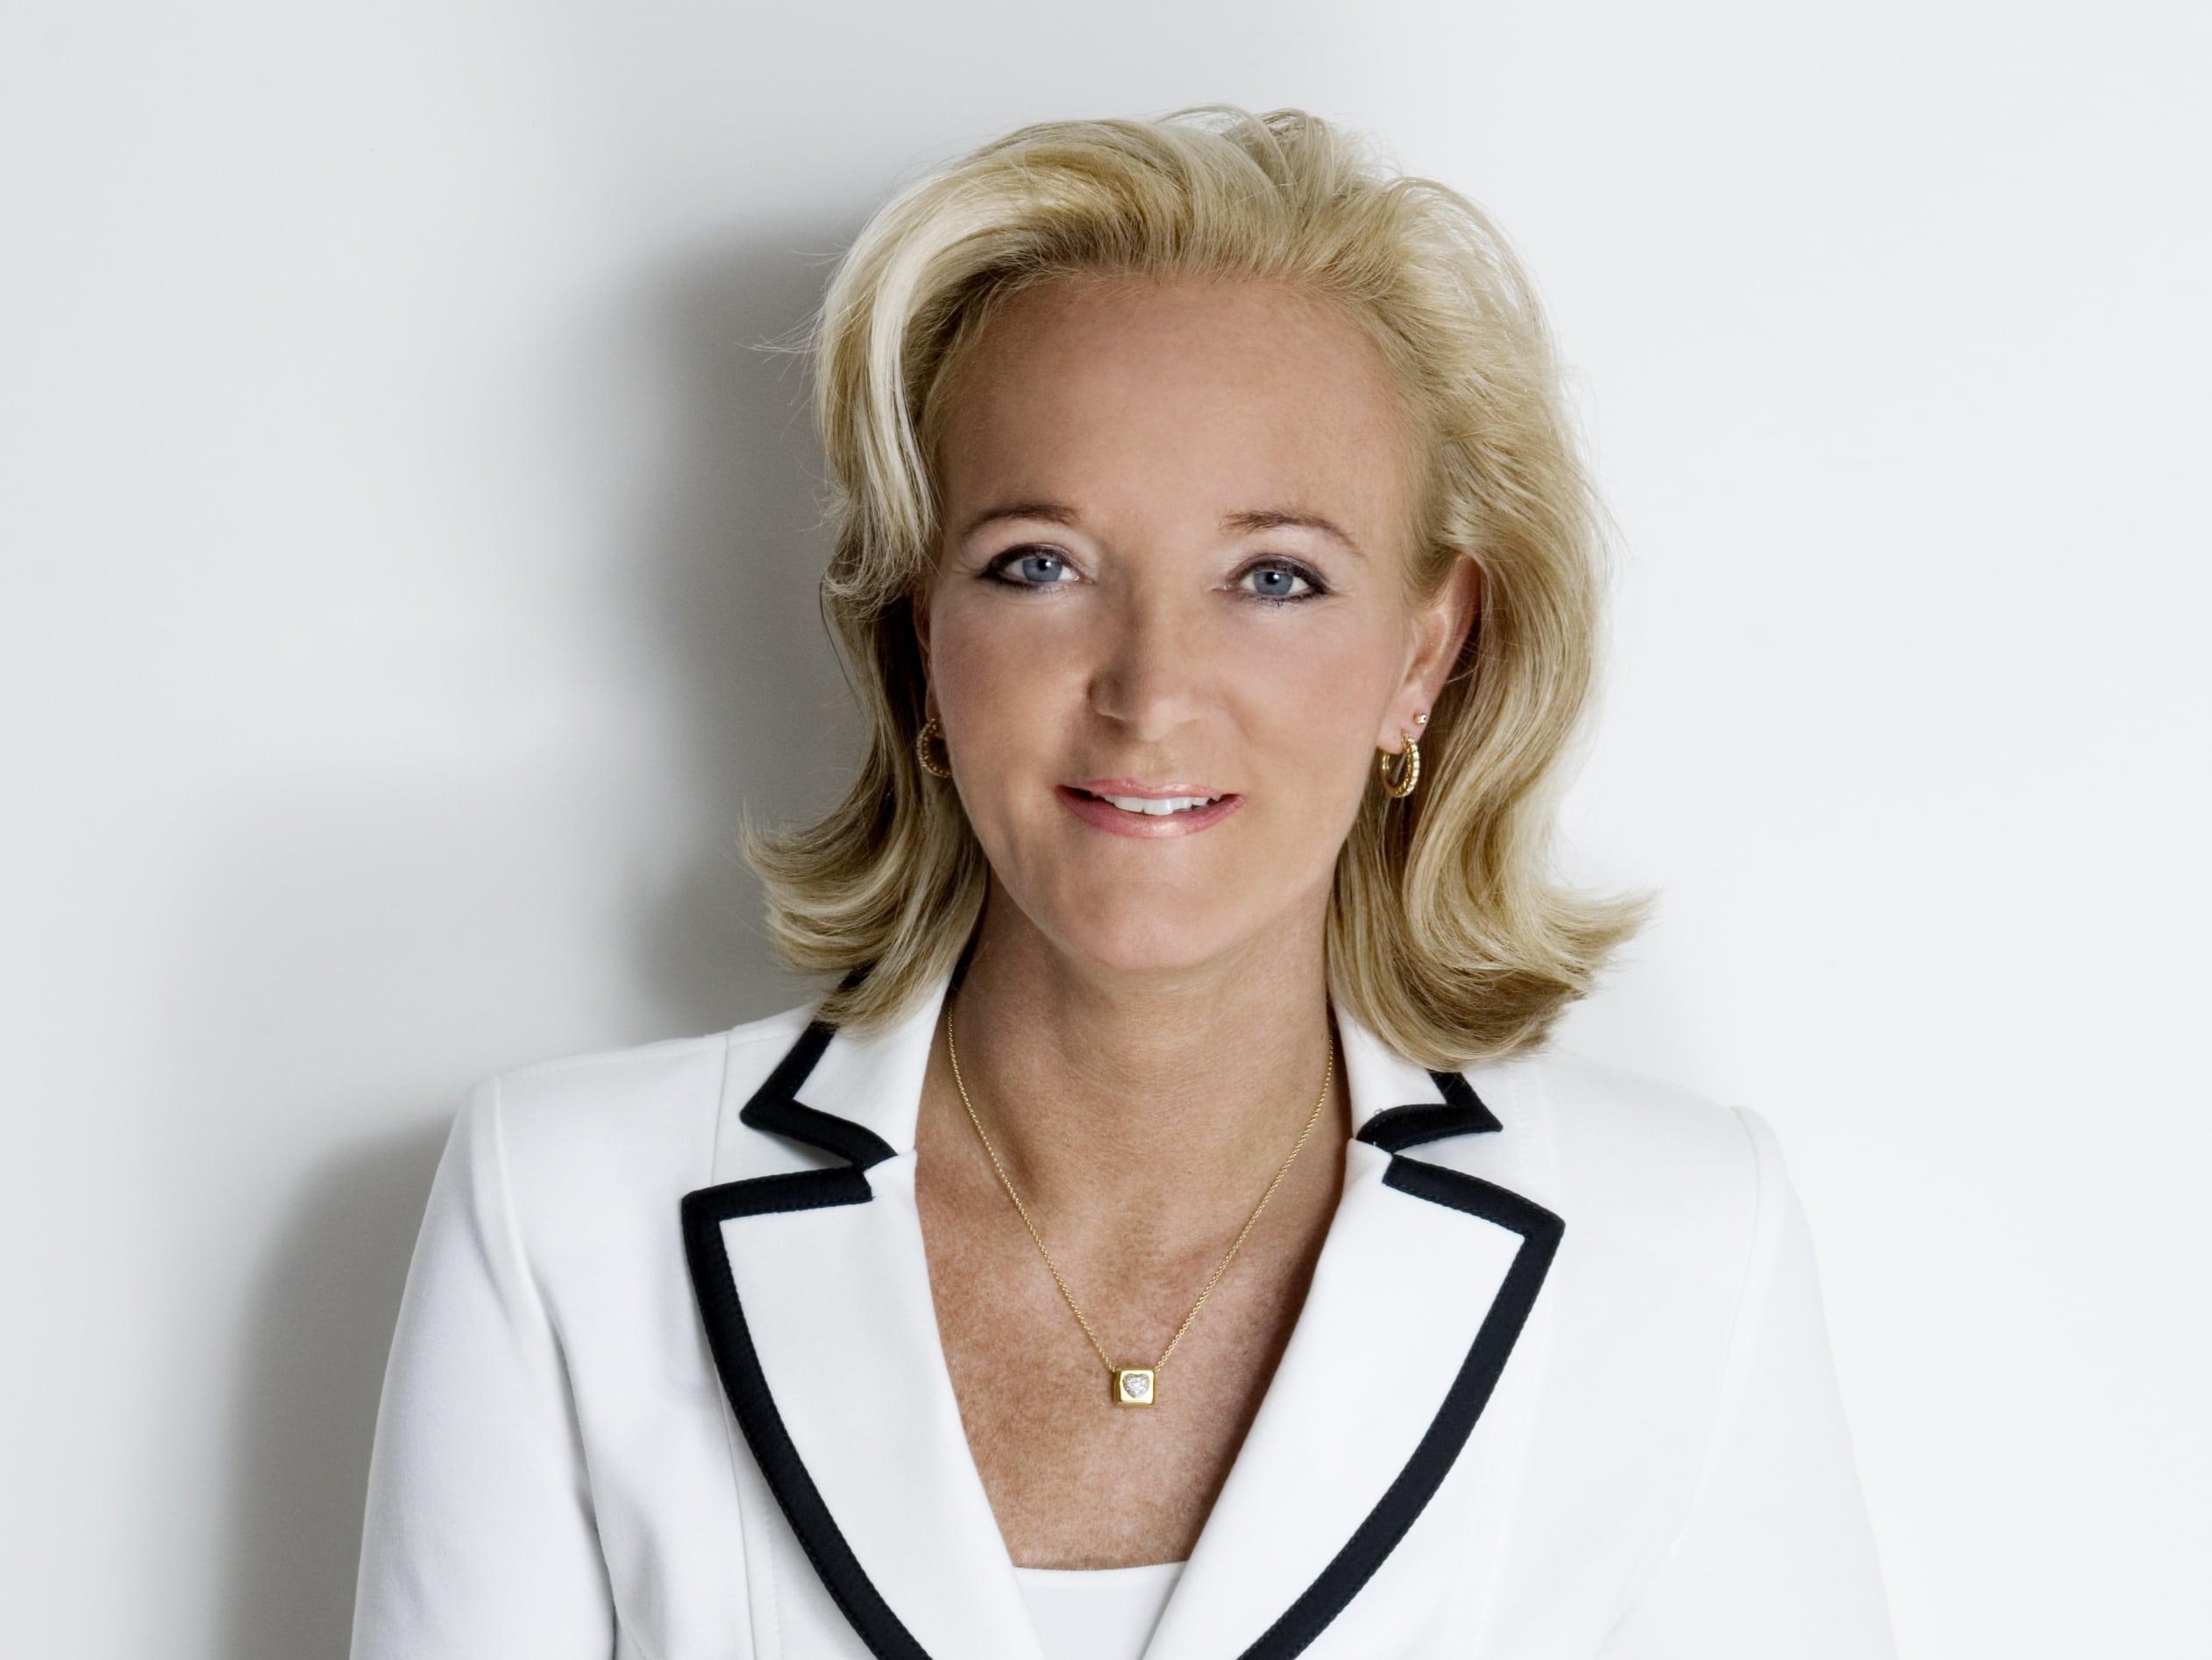 Sonja Buholzer